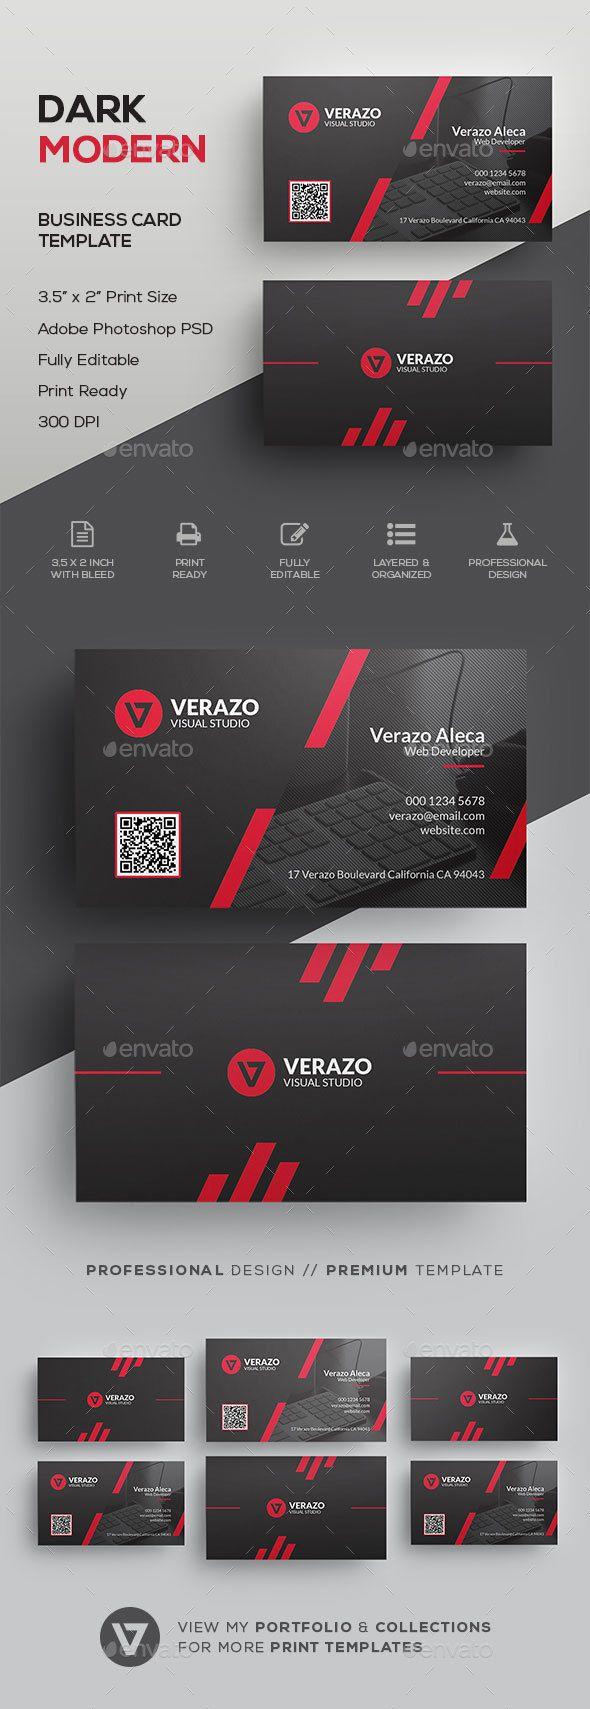 Dark & Modern Corporate Business Card Template - #Corporate #Business #Cards Download here:  https://graphicriver.net/item/dark-modern-corporate-business-card-template/19552222?ref=alena994